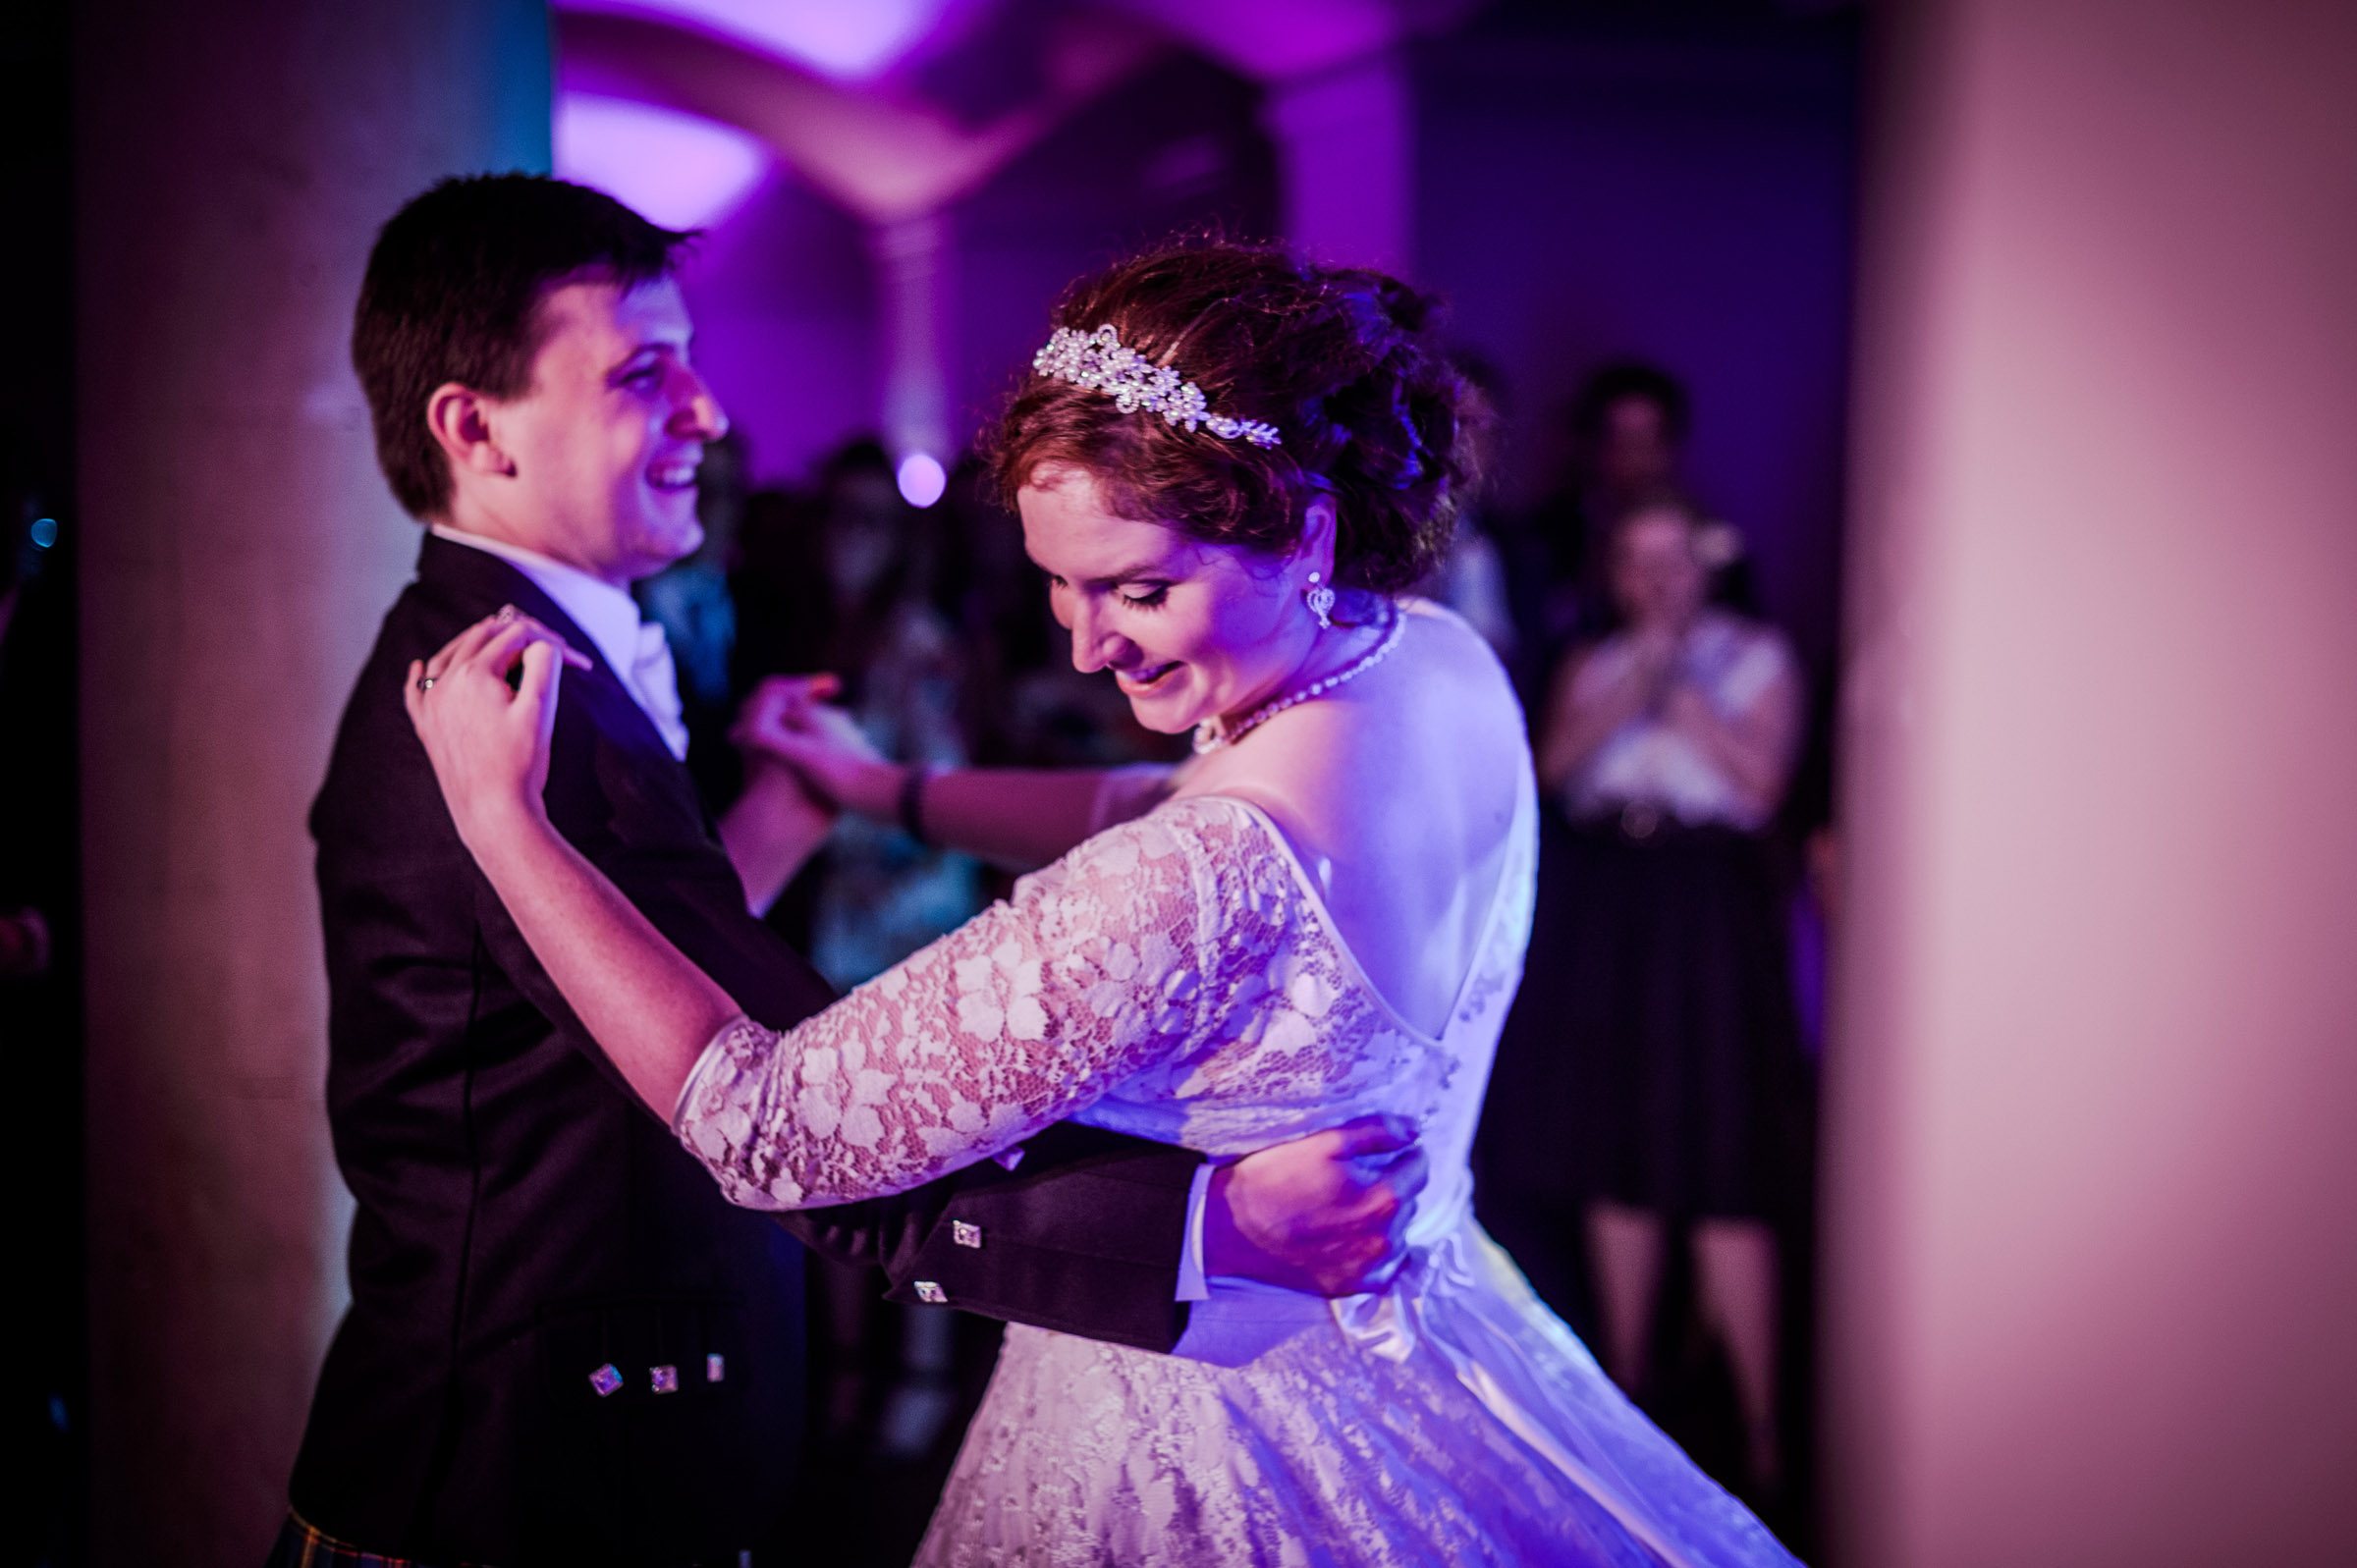 Ashmolean-Museum-Wedding-Pictures-0072.jpg